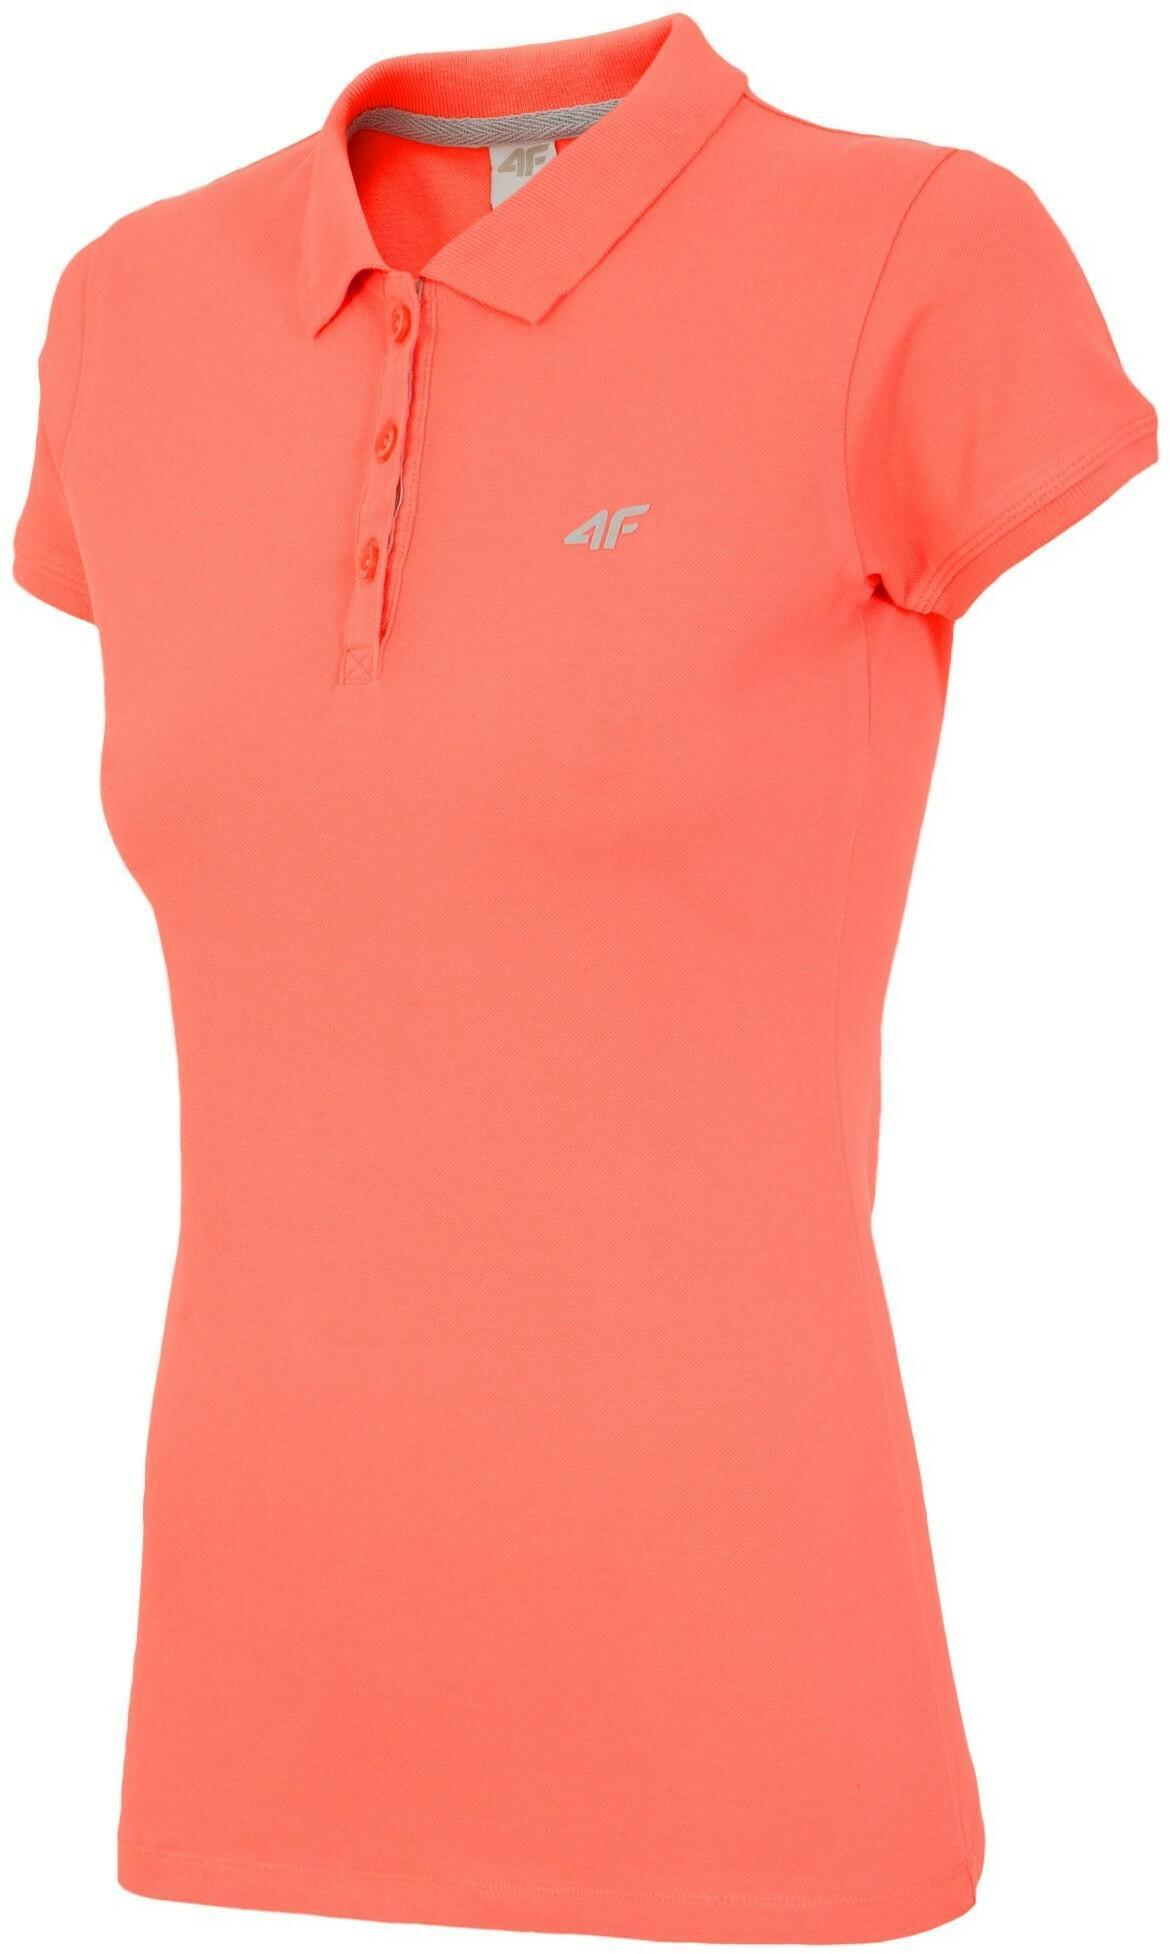 4F Koszulka polo damska TSD017 neon koral [H4L17-TSD017] TSD017 NEON KORAL